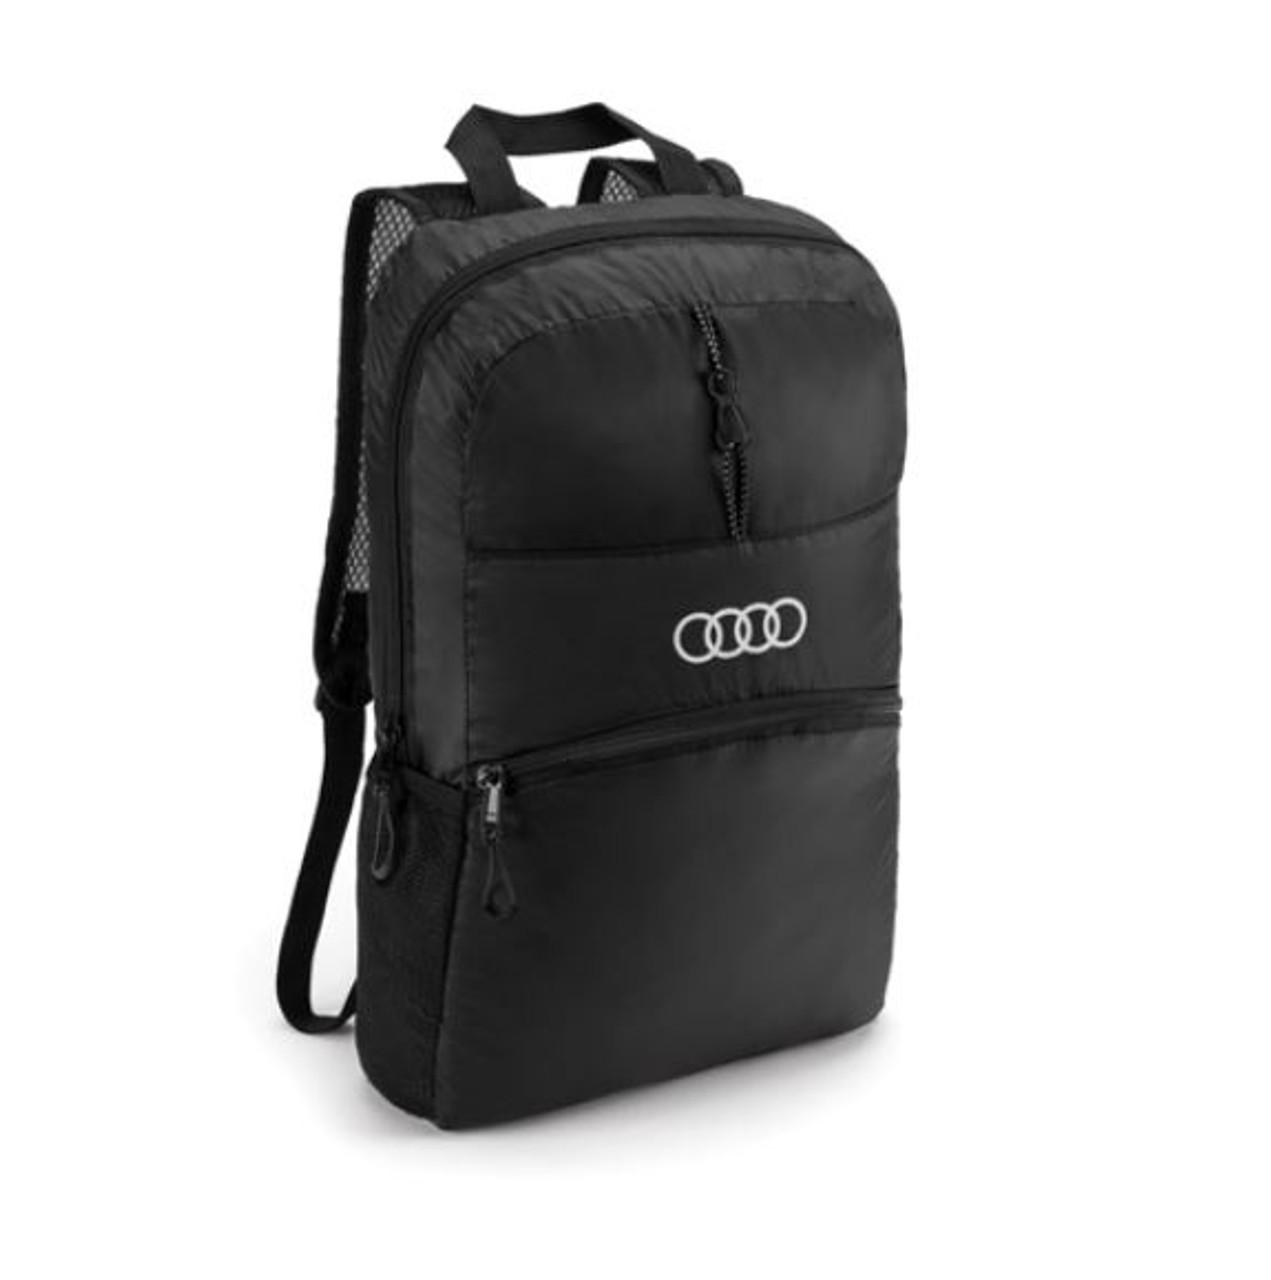 Audi Sport Rucksack //Audi Backpack 20L Audi Rucksack